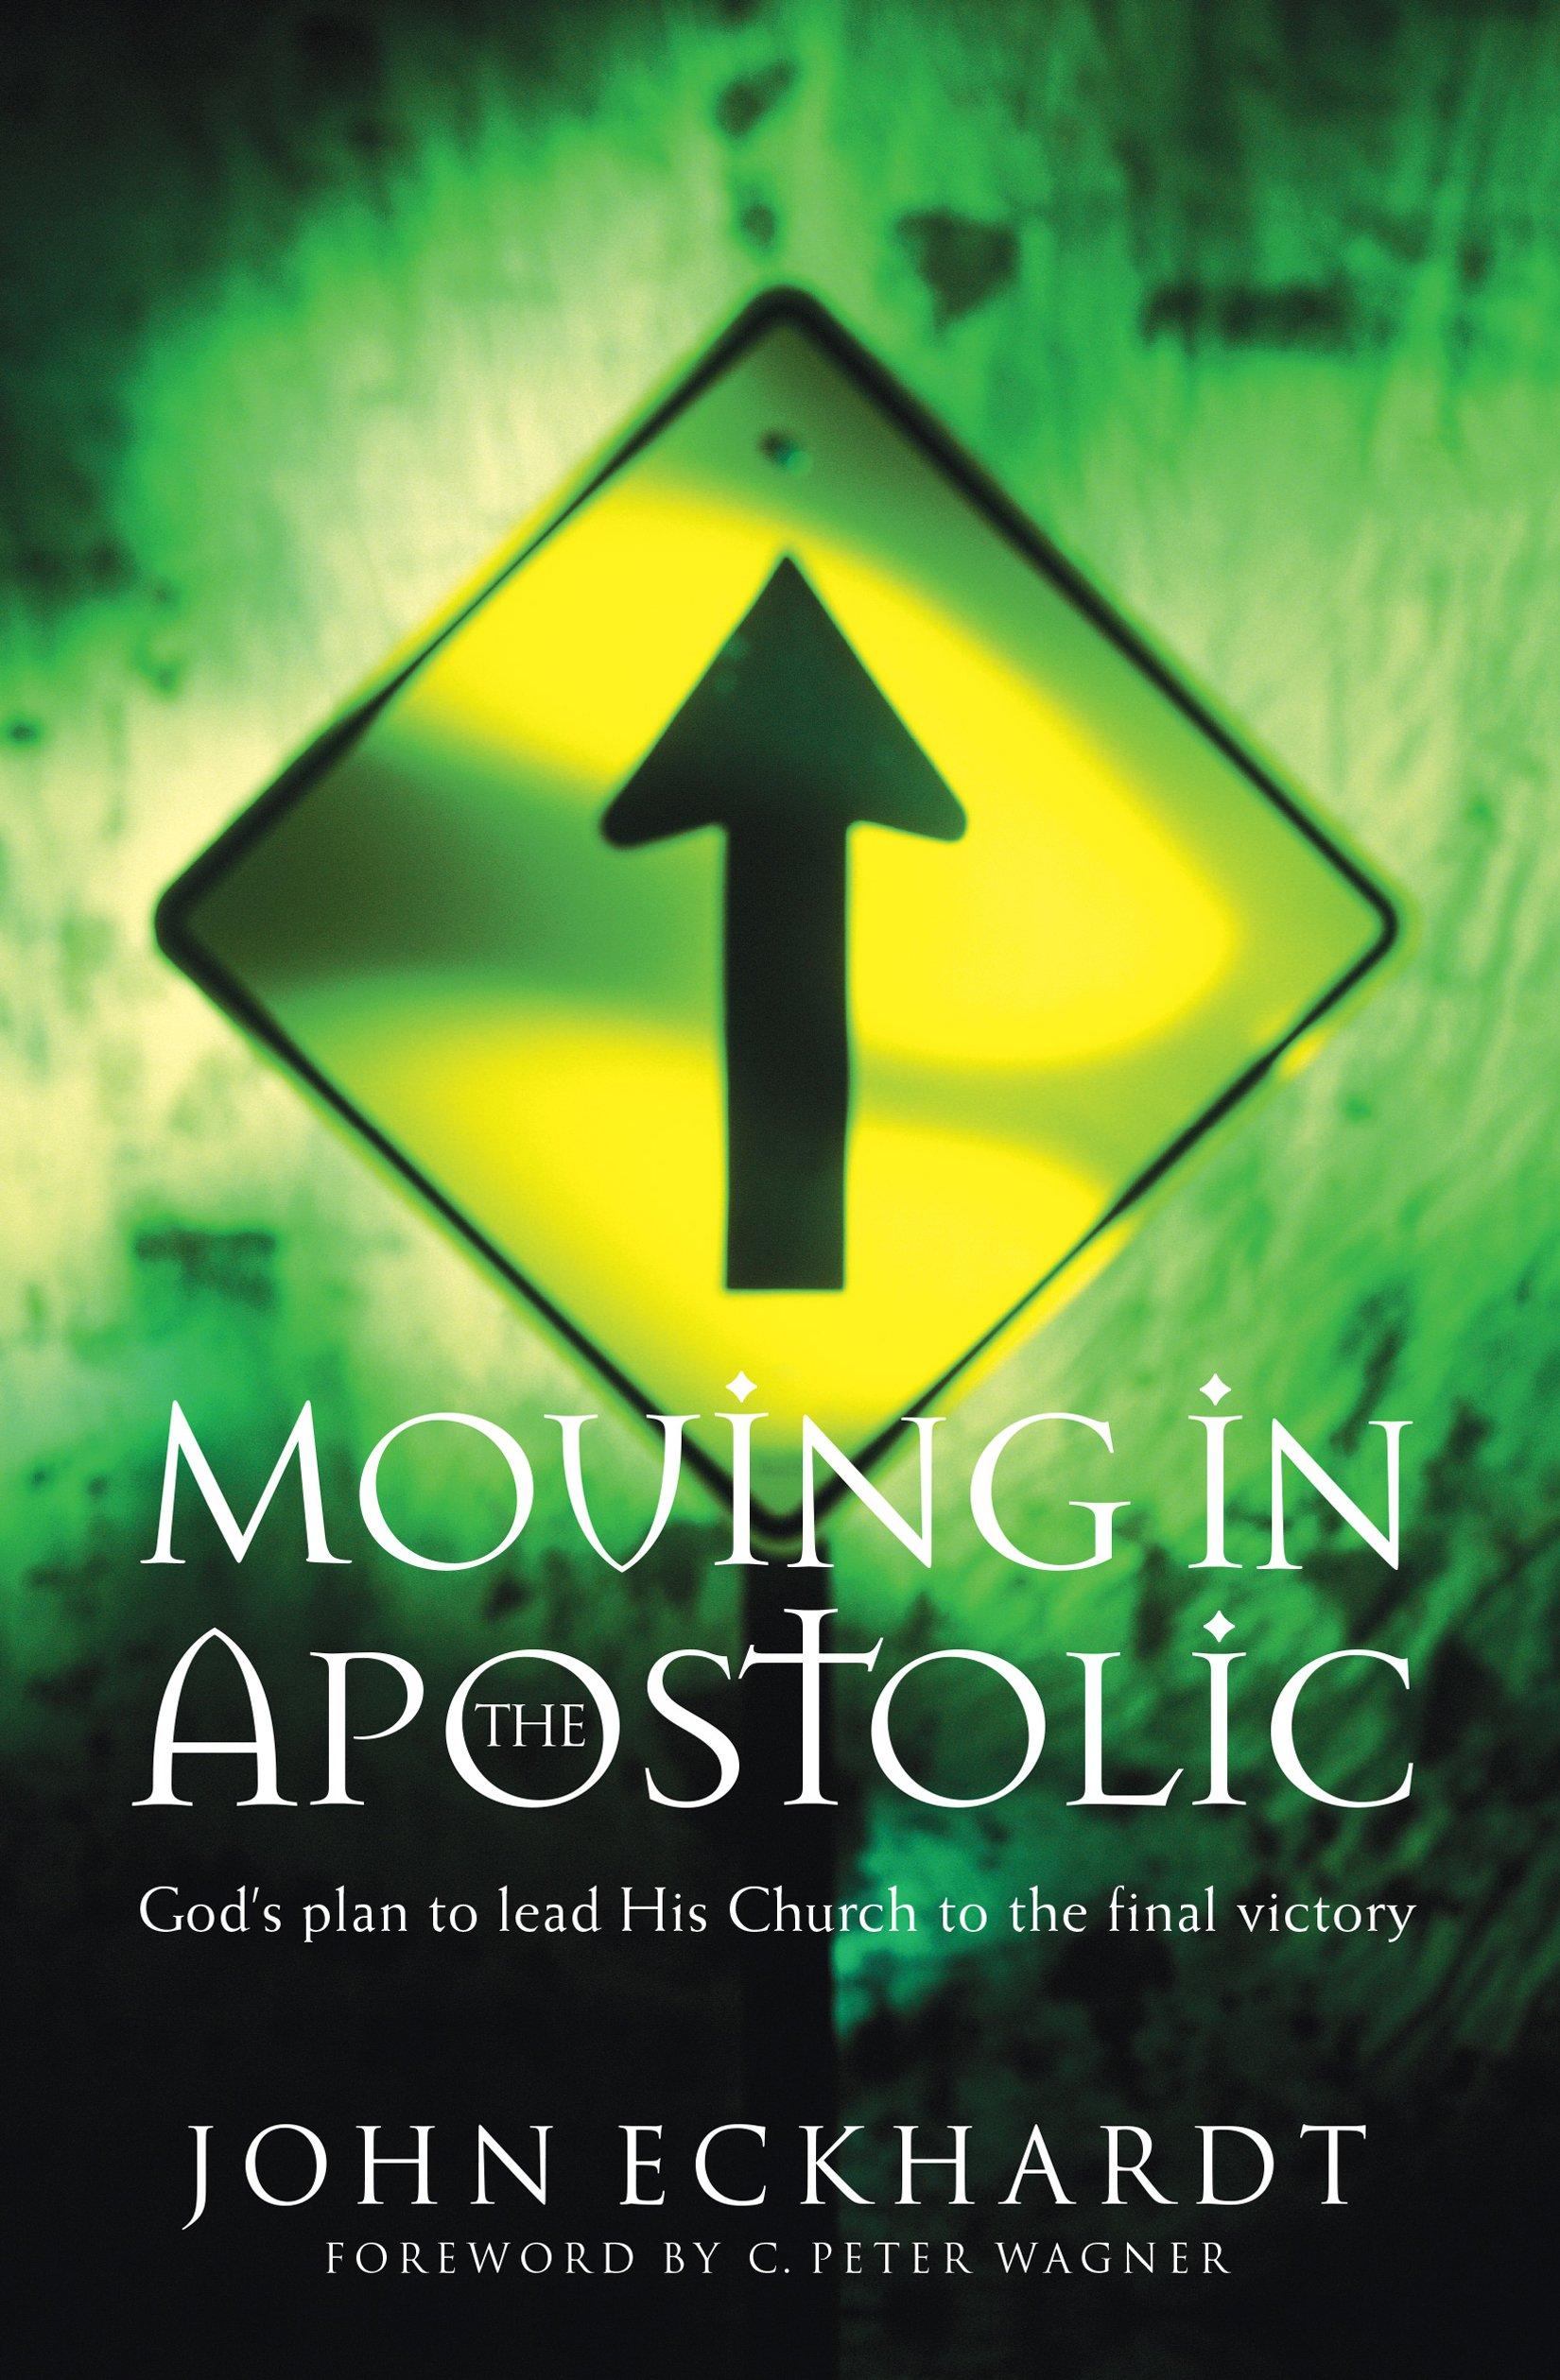 Moving in the apostolic john eckhardt c wagner 9780800796464 moving in the apostolic john eckhardt c wagner 9780800796464 amazon books fandeluxe Choice Image